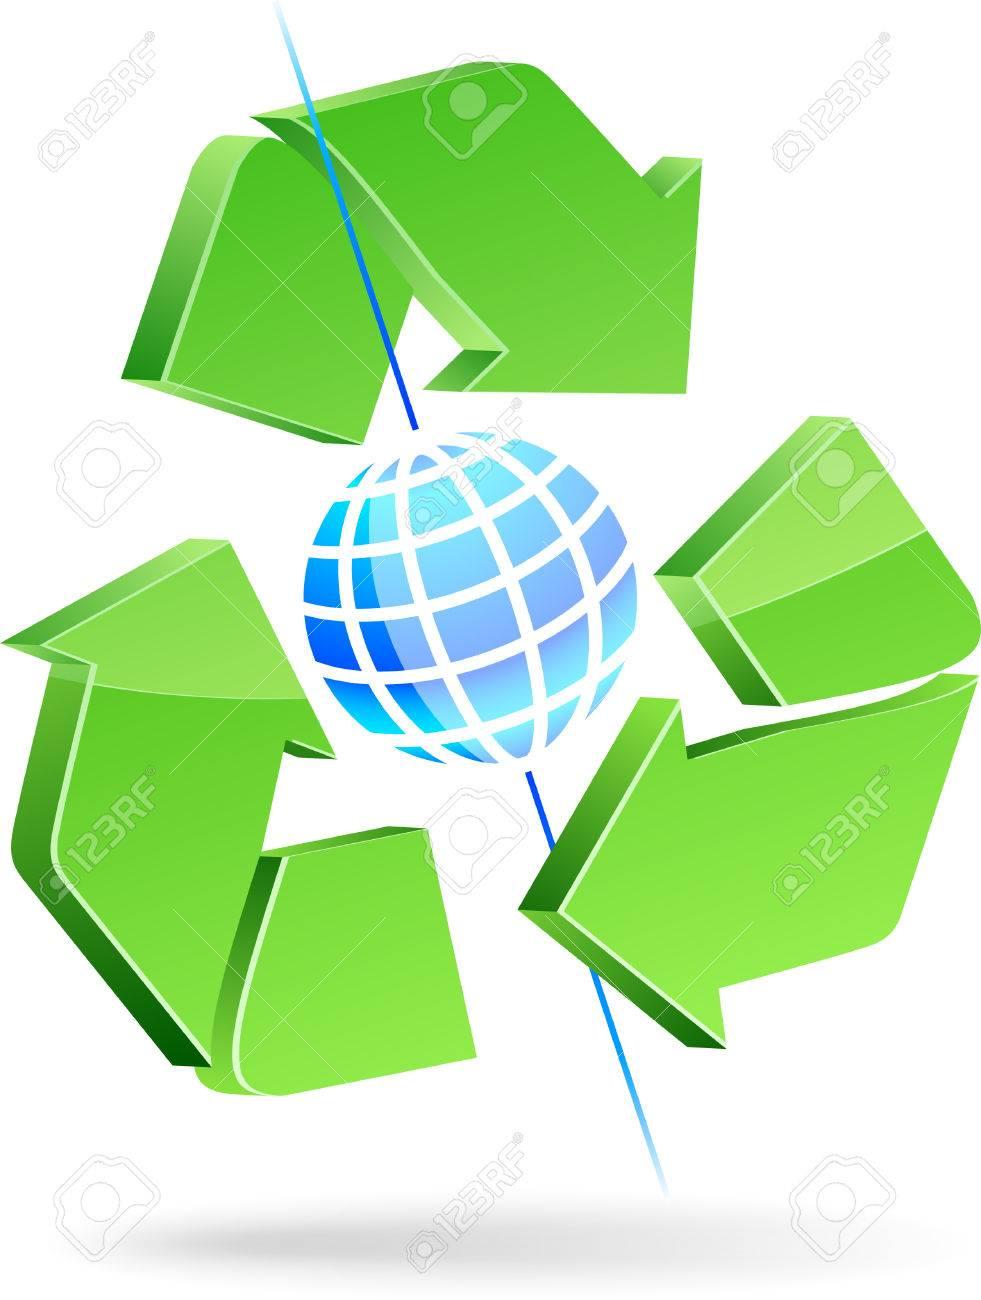 Save earth symbol. Vector illustration. Stock Vector - 5016174